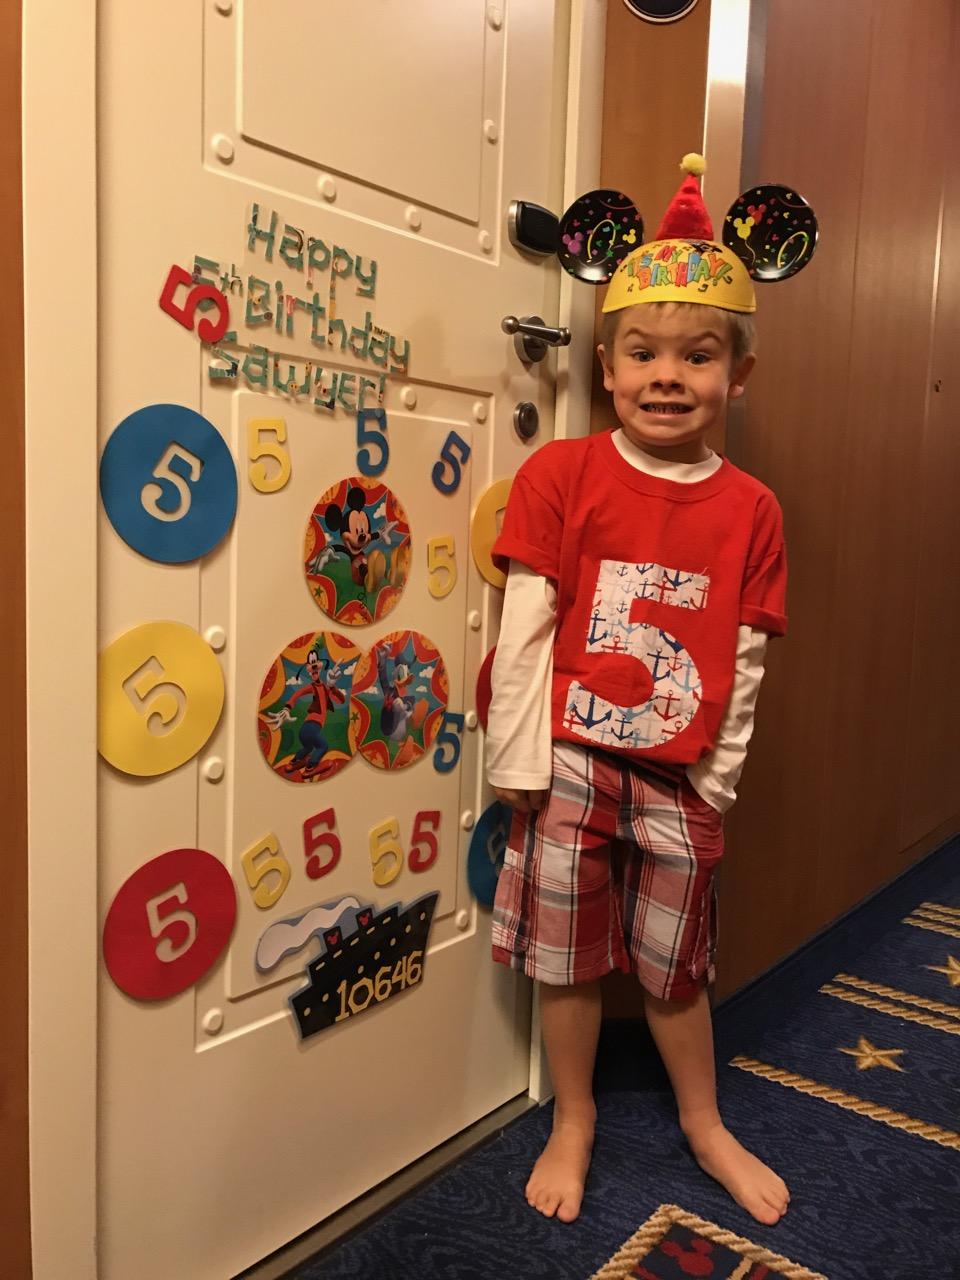 Disney Dream Stateroom Birthday Door Decorations